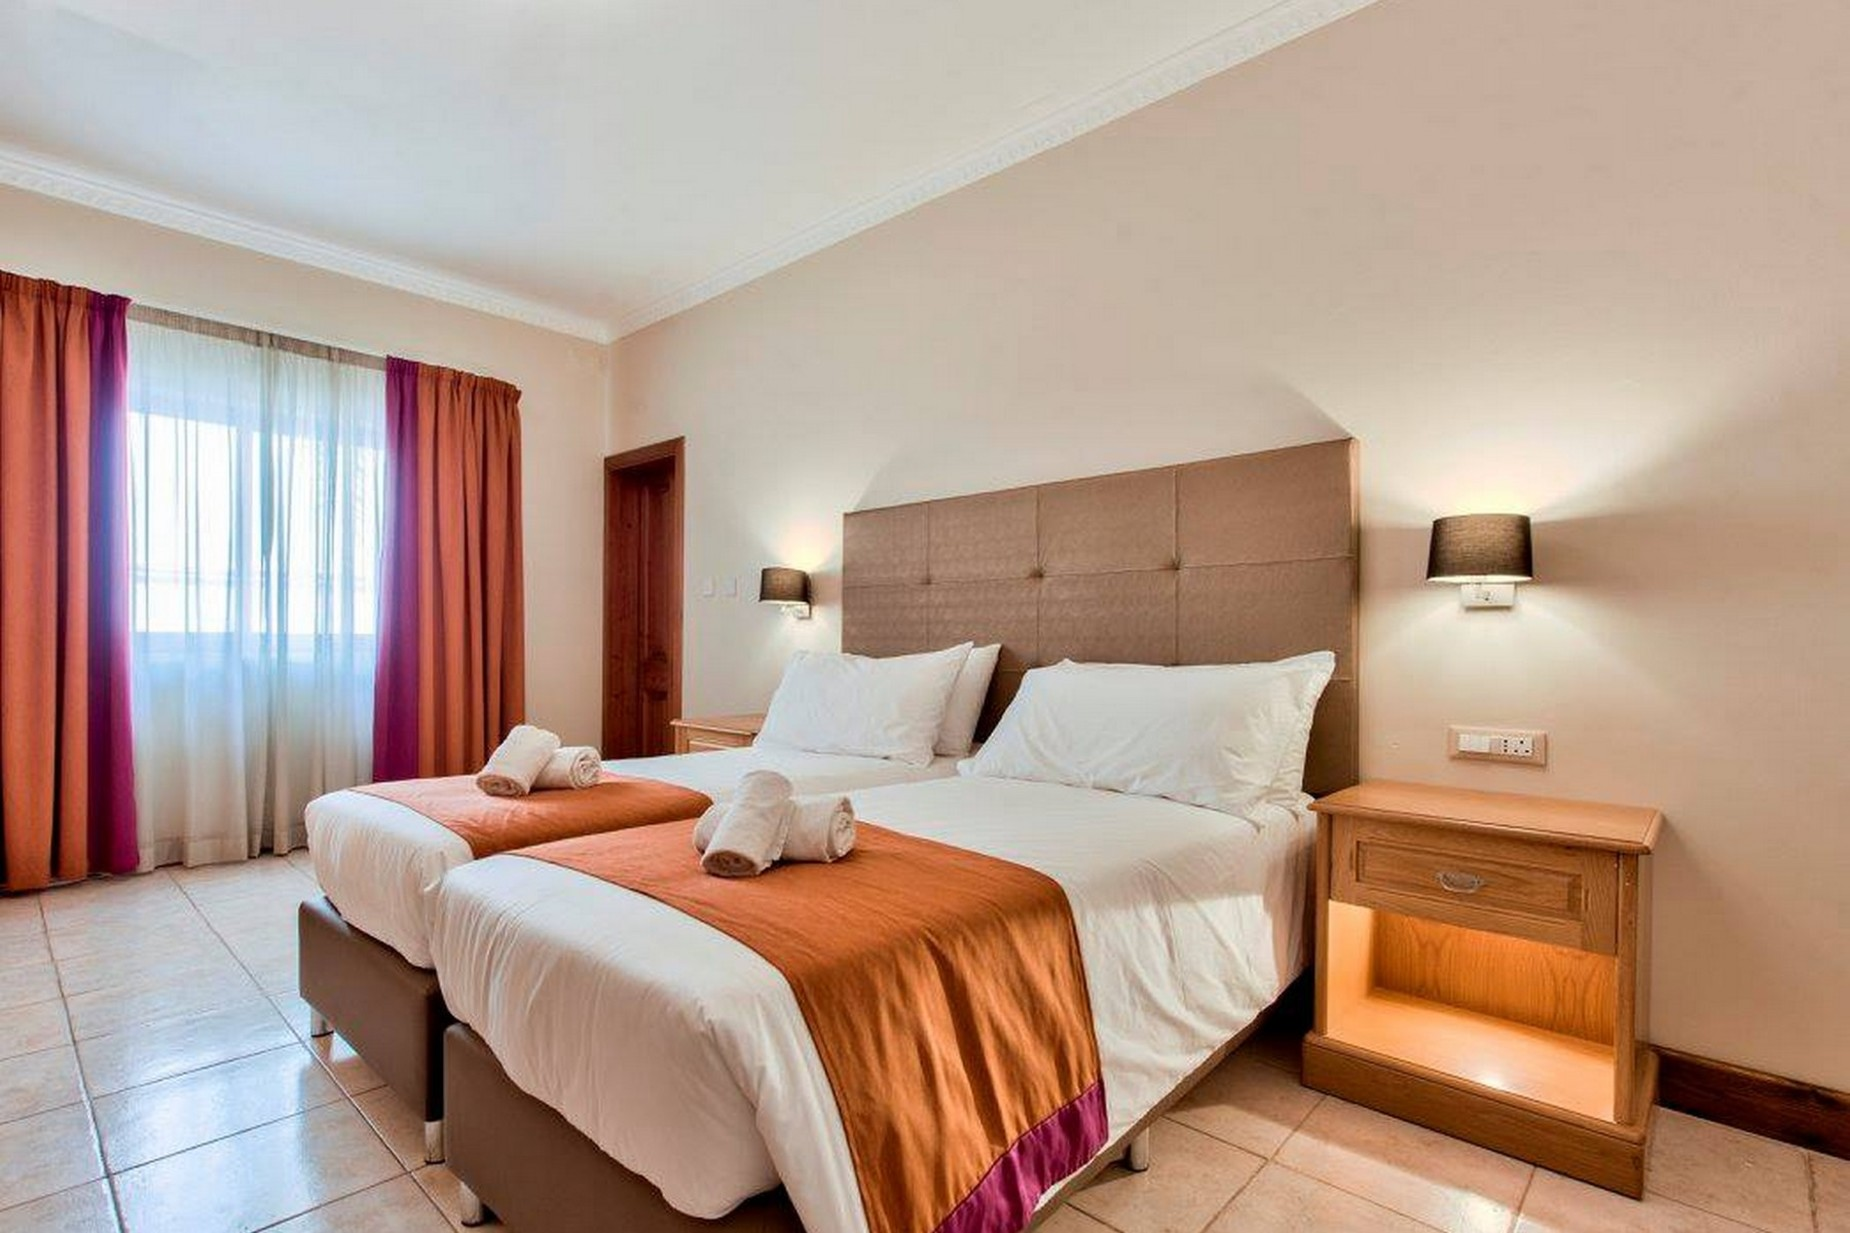 3 bed Villa For Rent in Mellieha, Mellieha - thumb 11